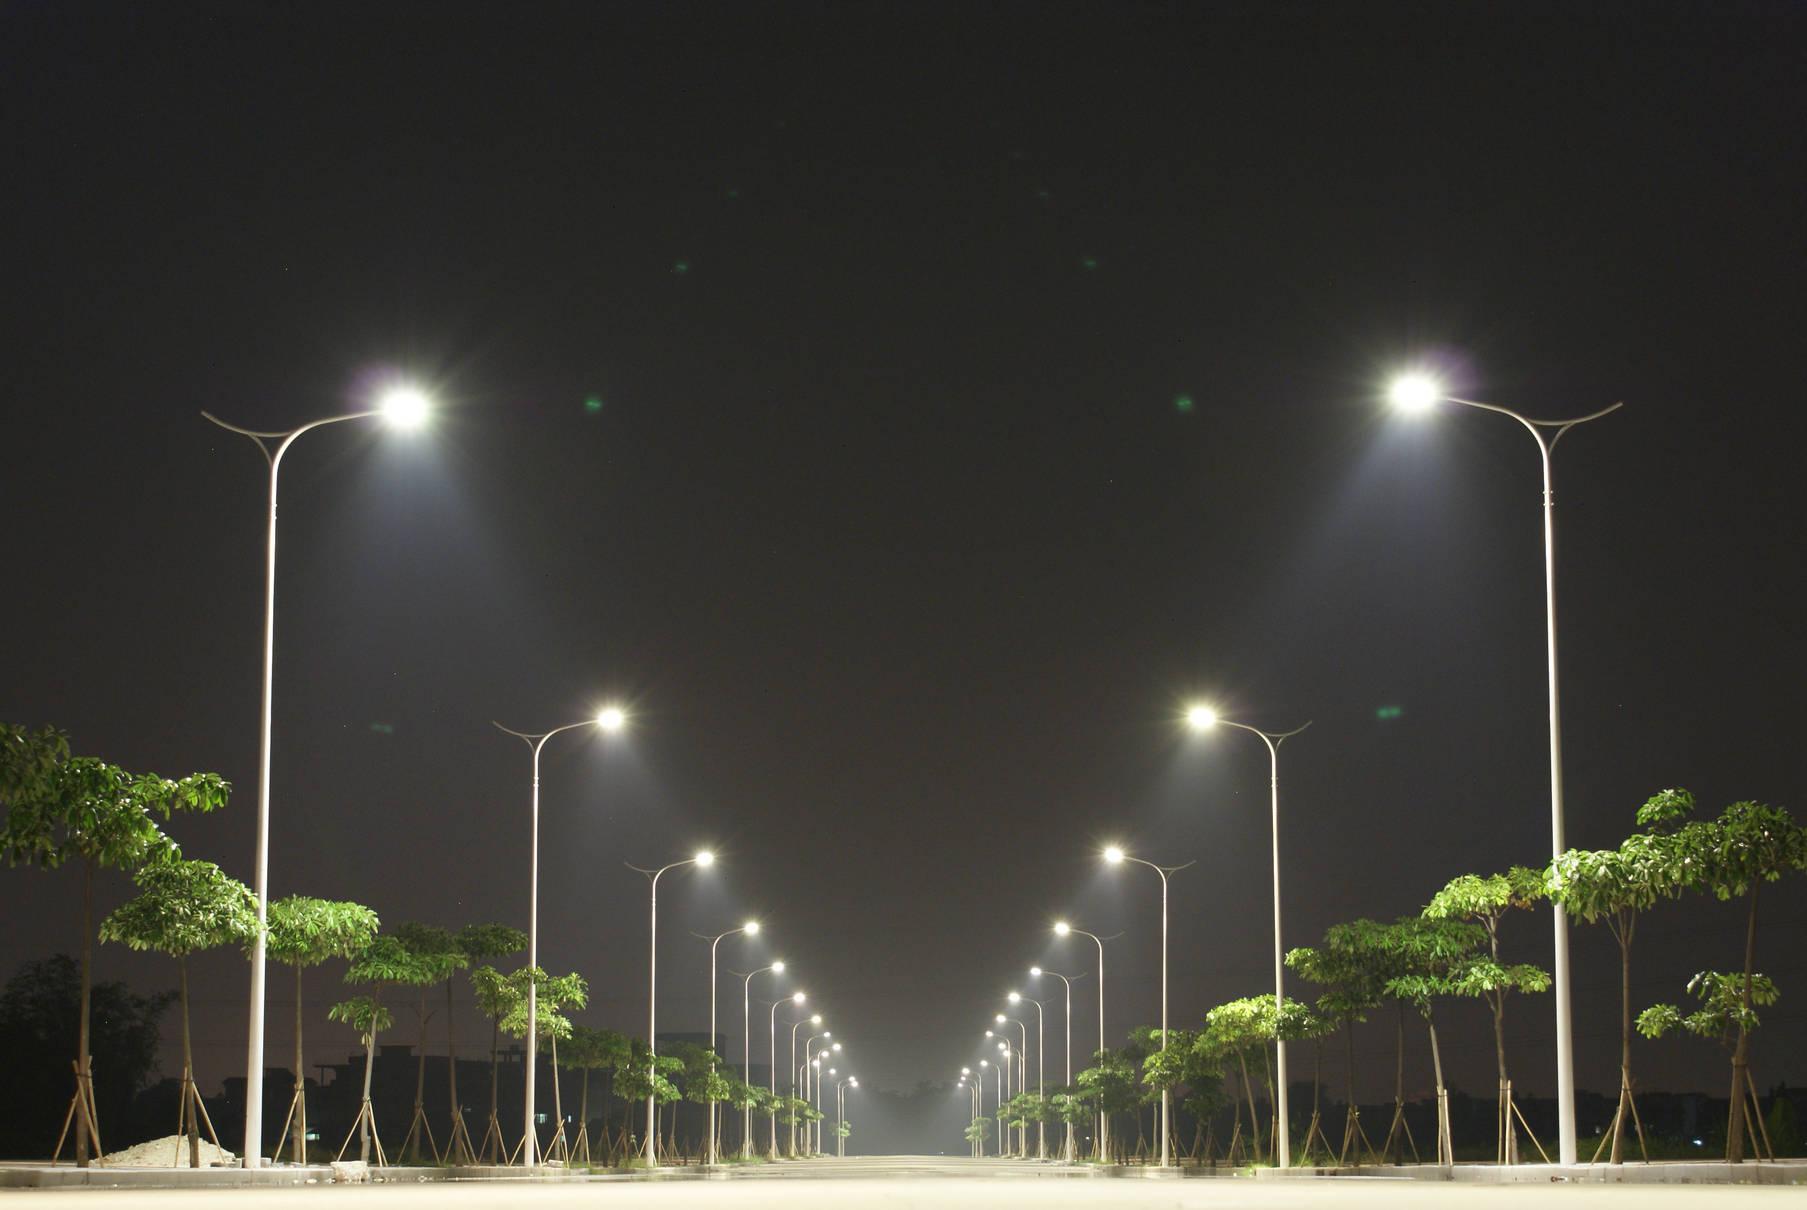 Cheap RoHs CE 120w high power newest design LED street light